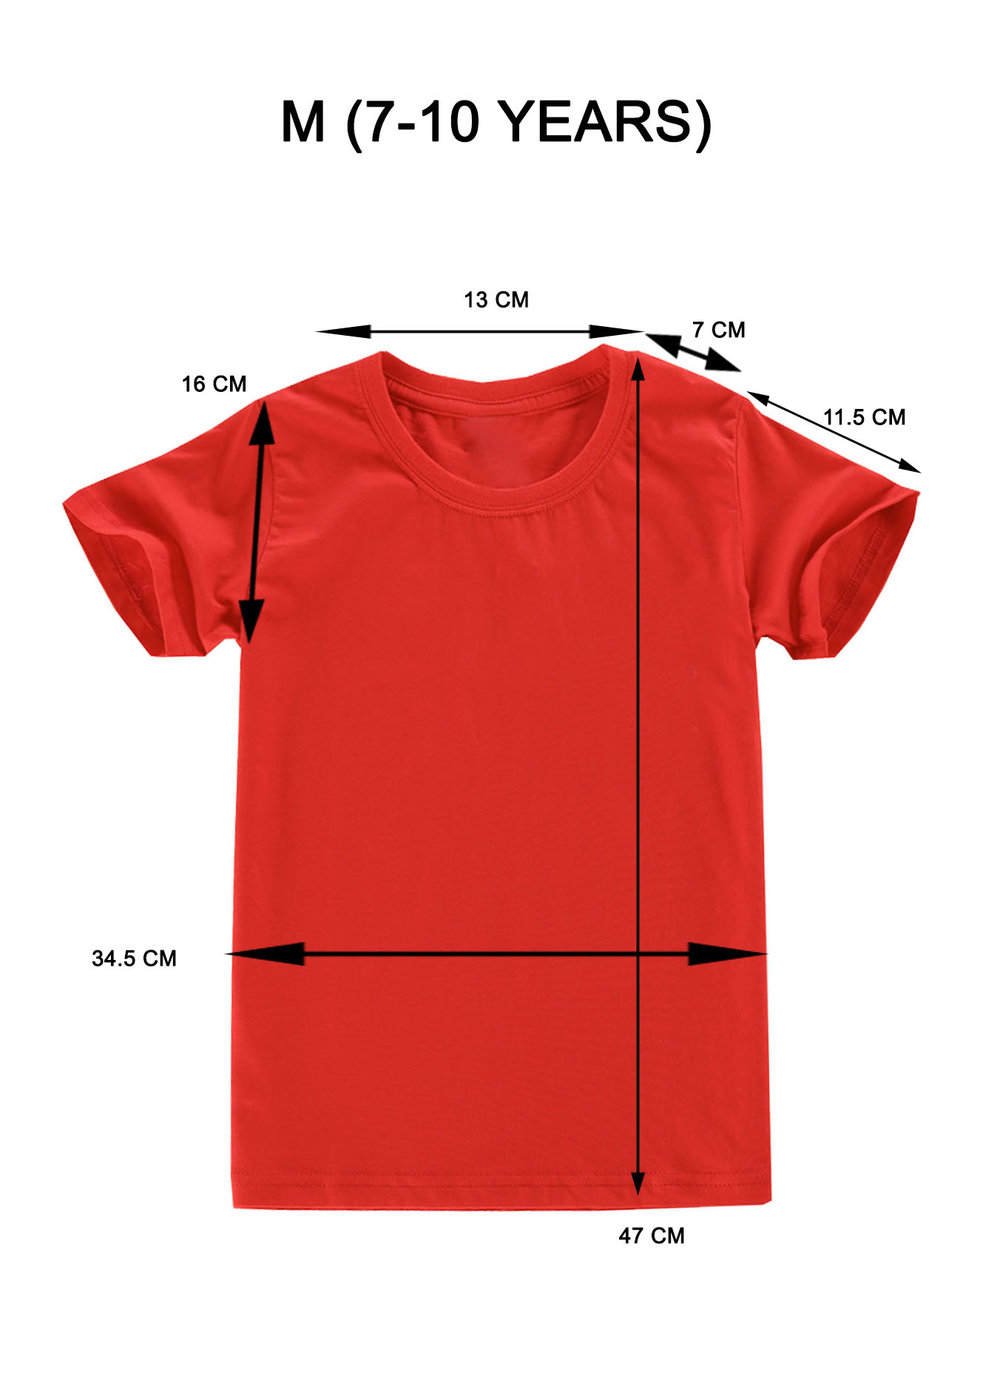 T Shirt Red M.jpg